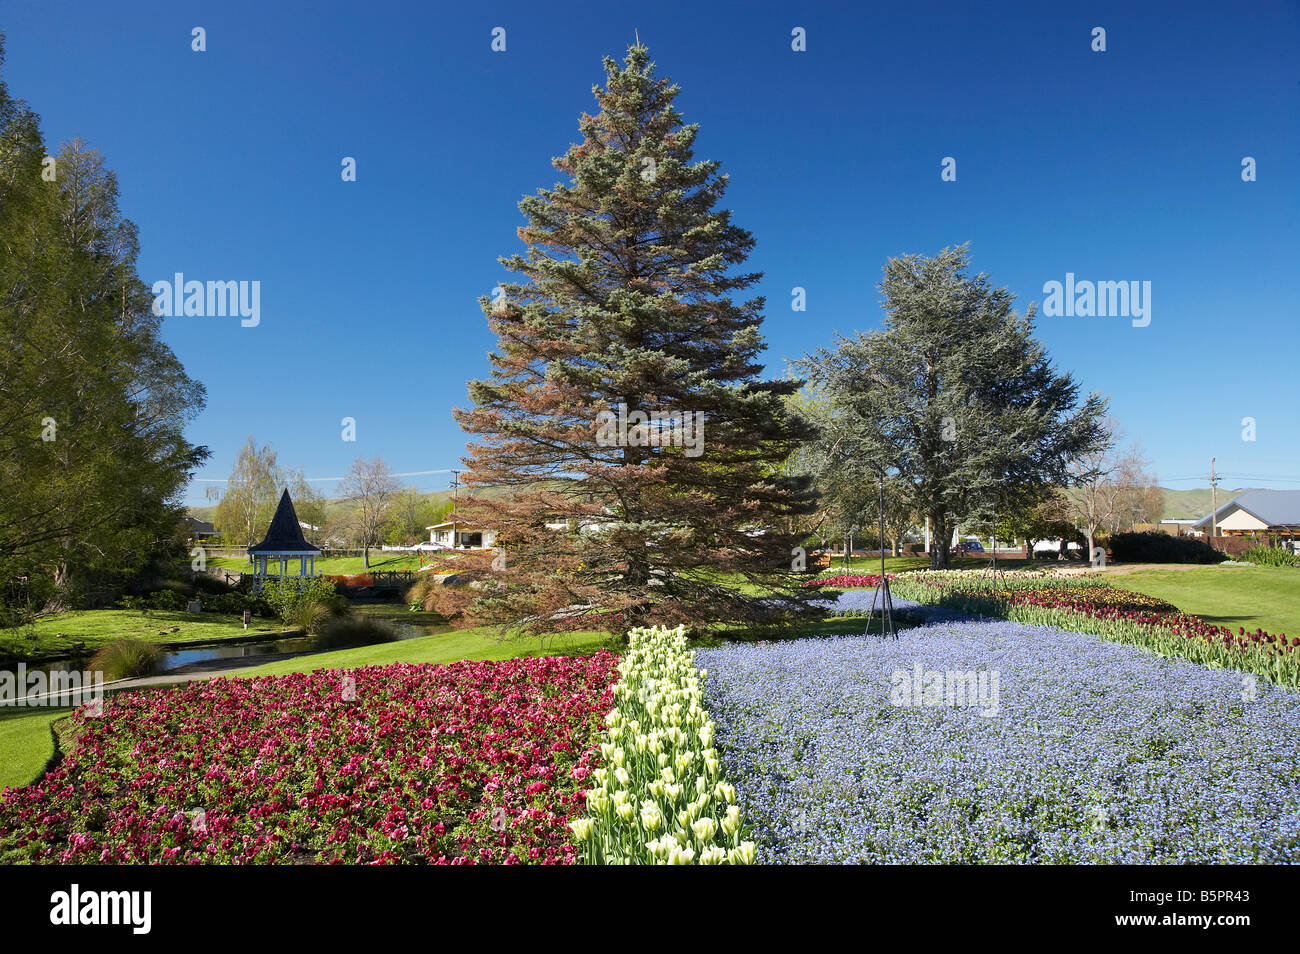 Spring Flowers Pollard Park Blenheim Marlborough South Island New Zealand - Stock Image